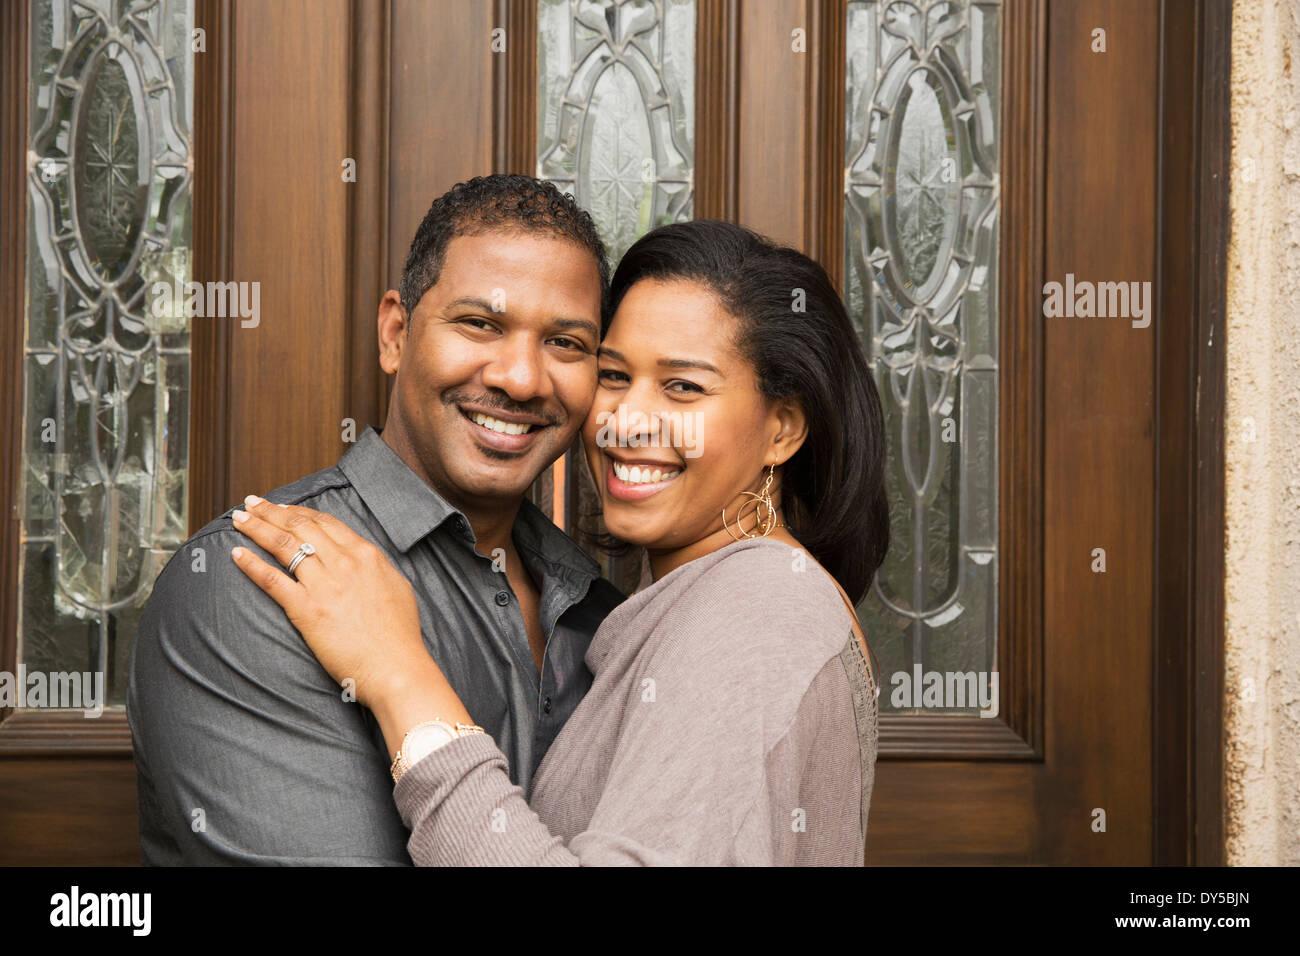 Portrait of happy mid adult couple at front door - Stock Image